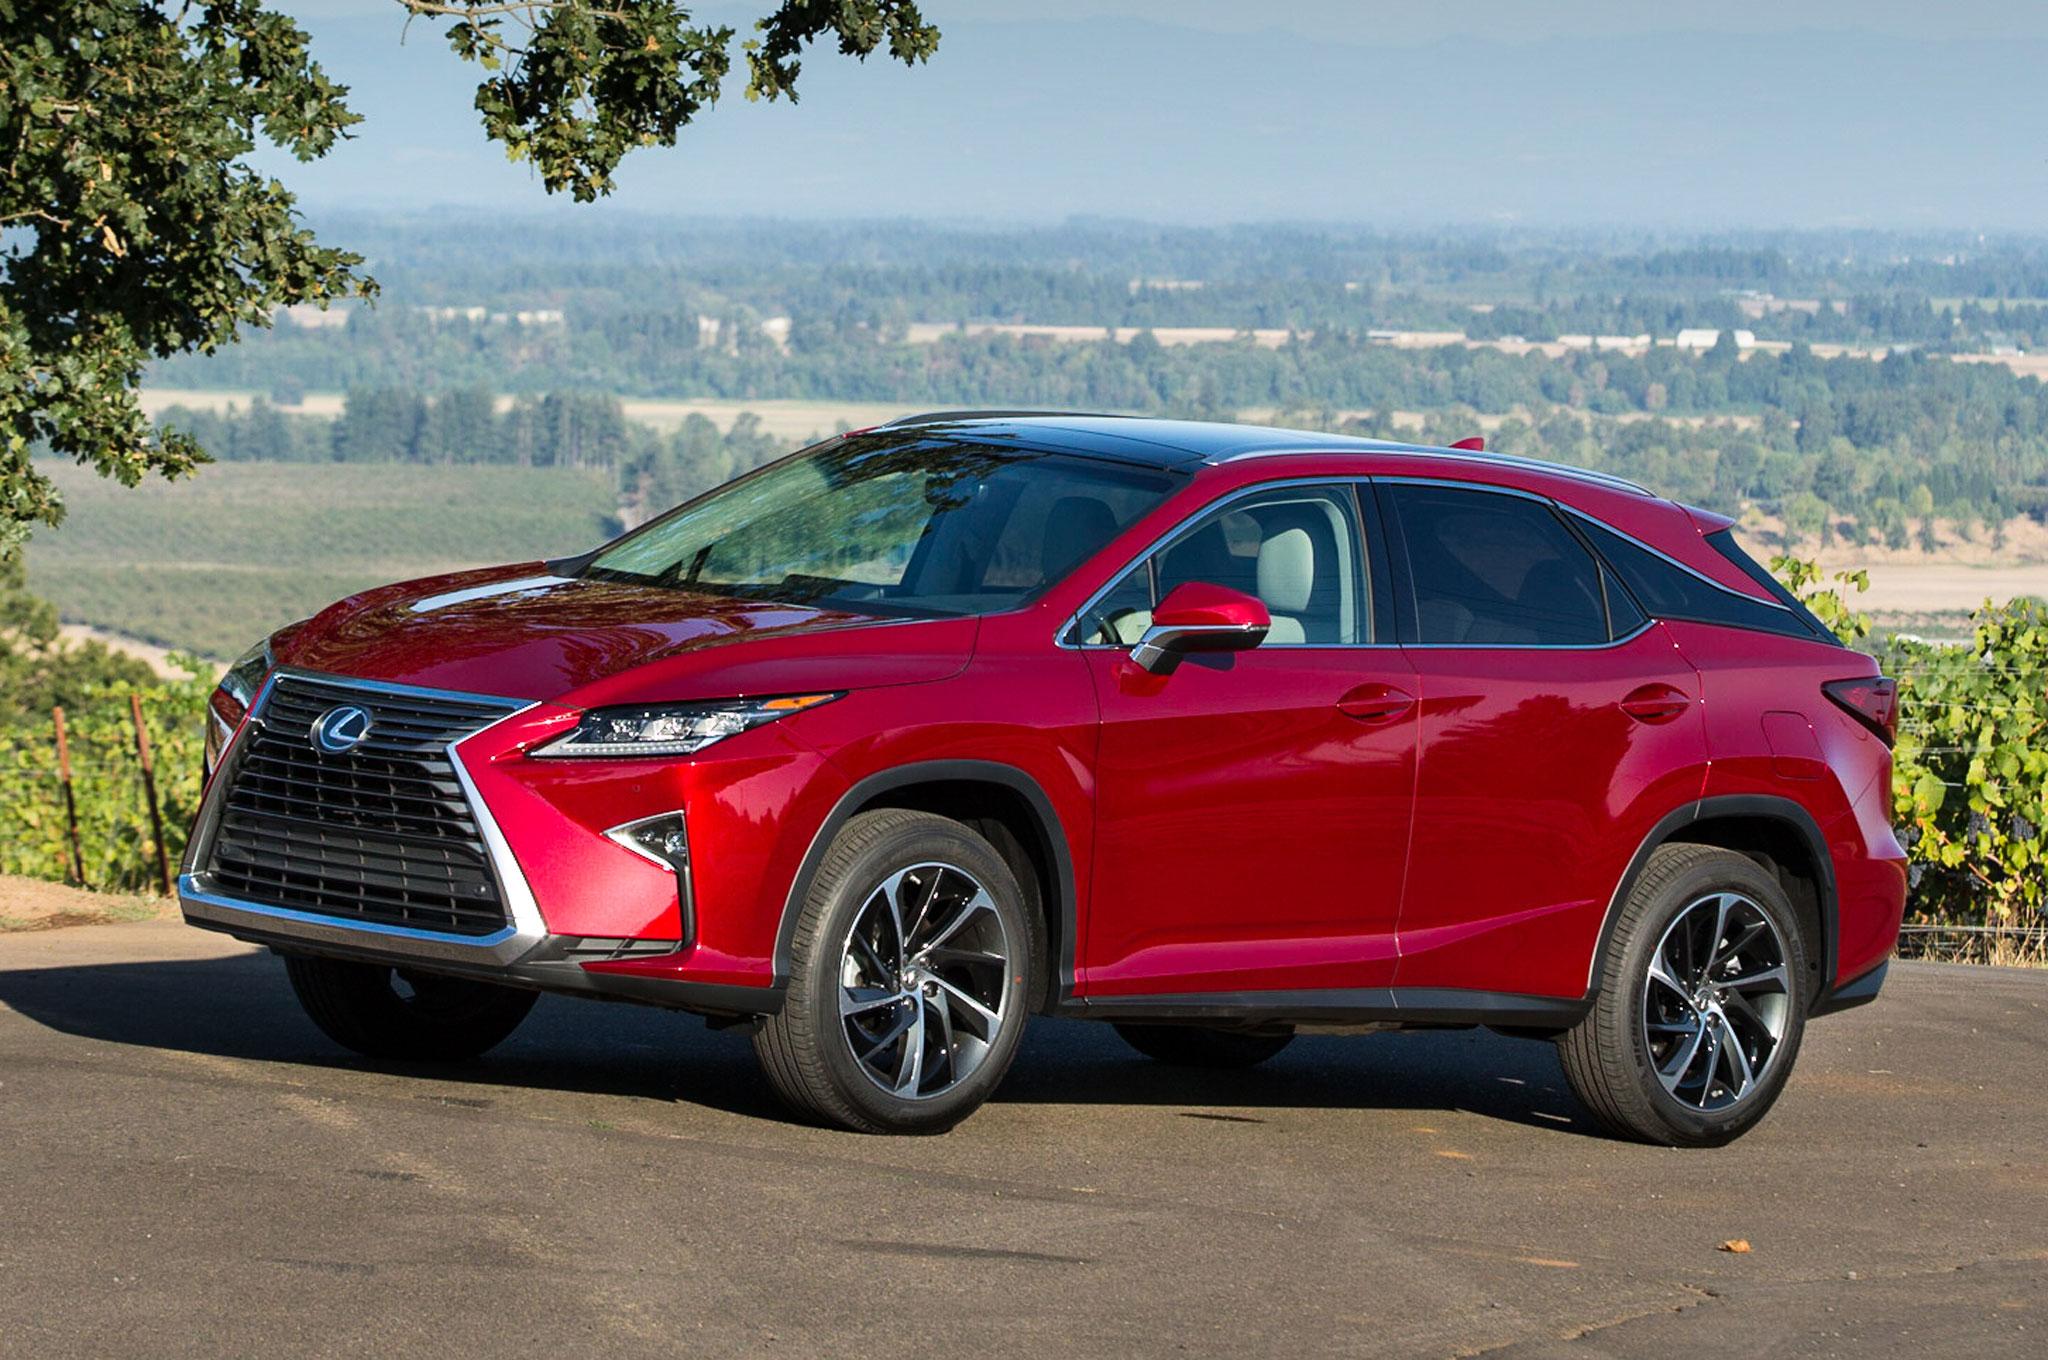 2016 LEXUS RX 350 AWD $485 Per Month